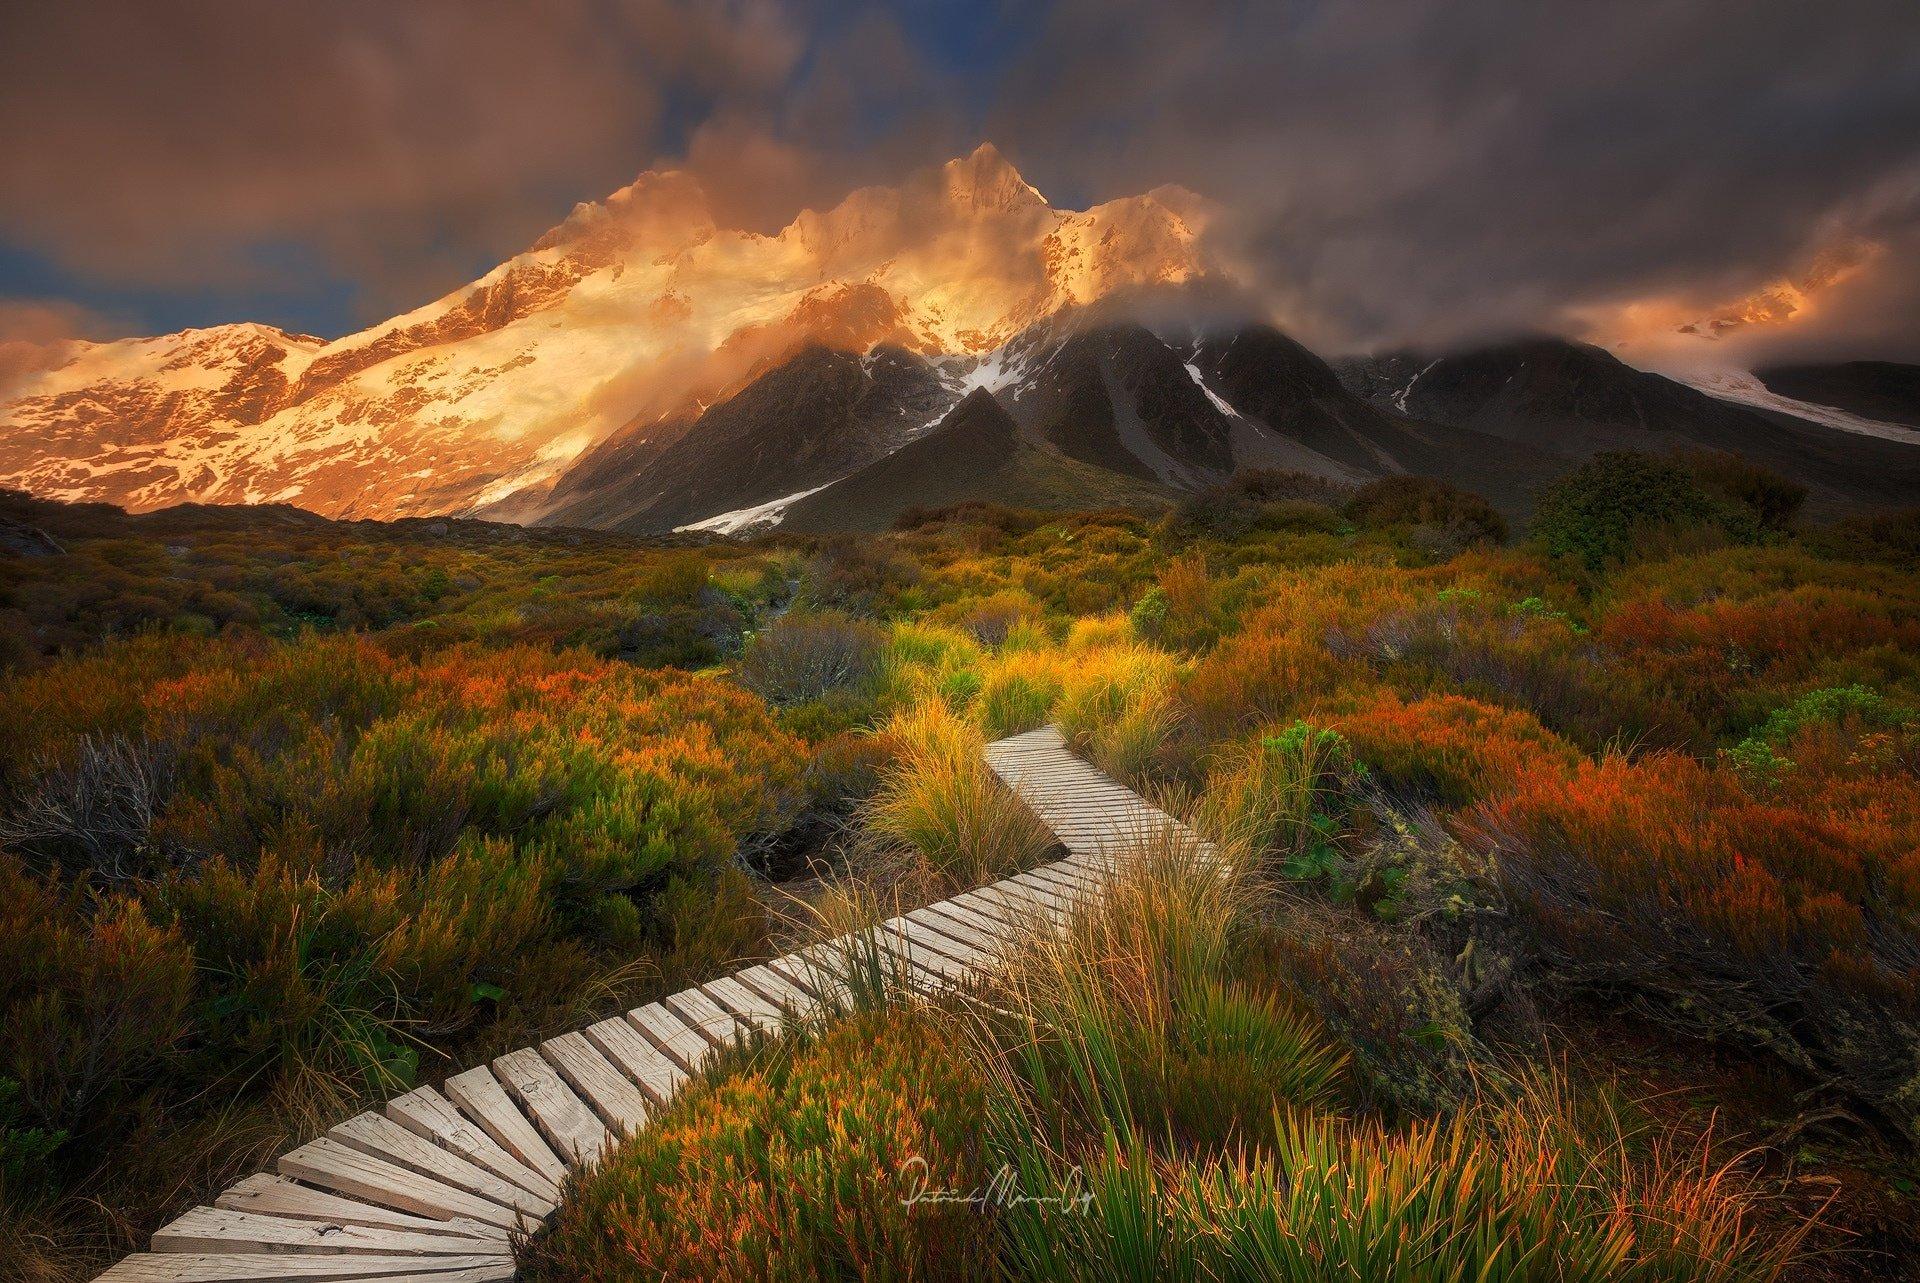 Amoklauf Neuseeland Hd: Sefton's Garden, Aoraki National Park, New Zealand HD